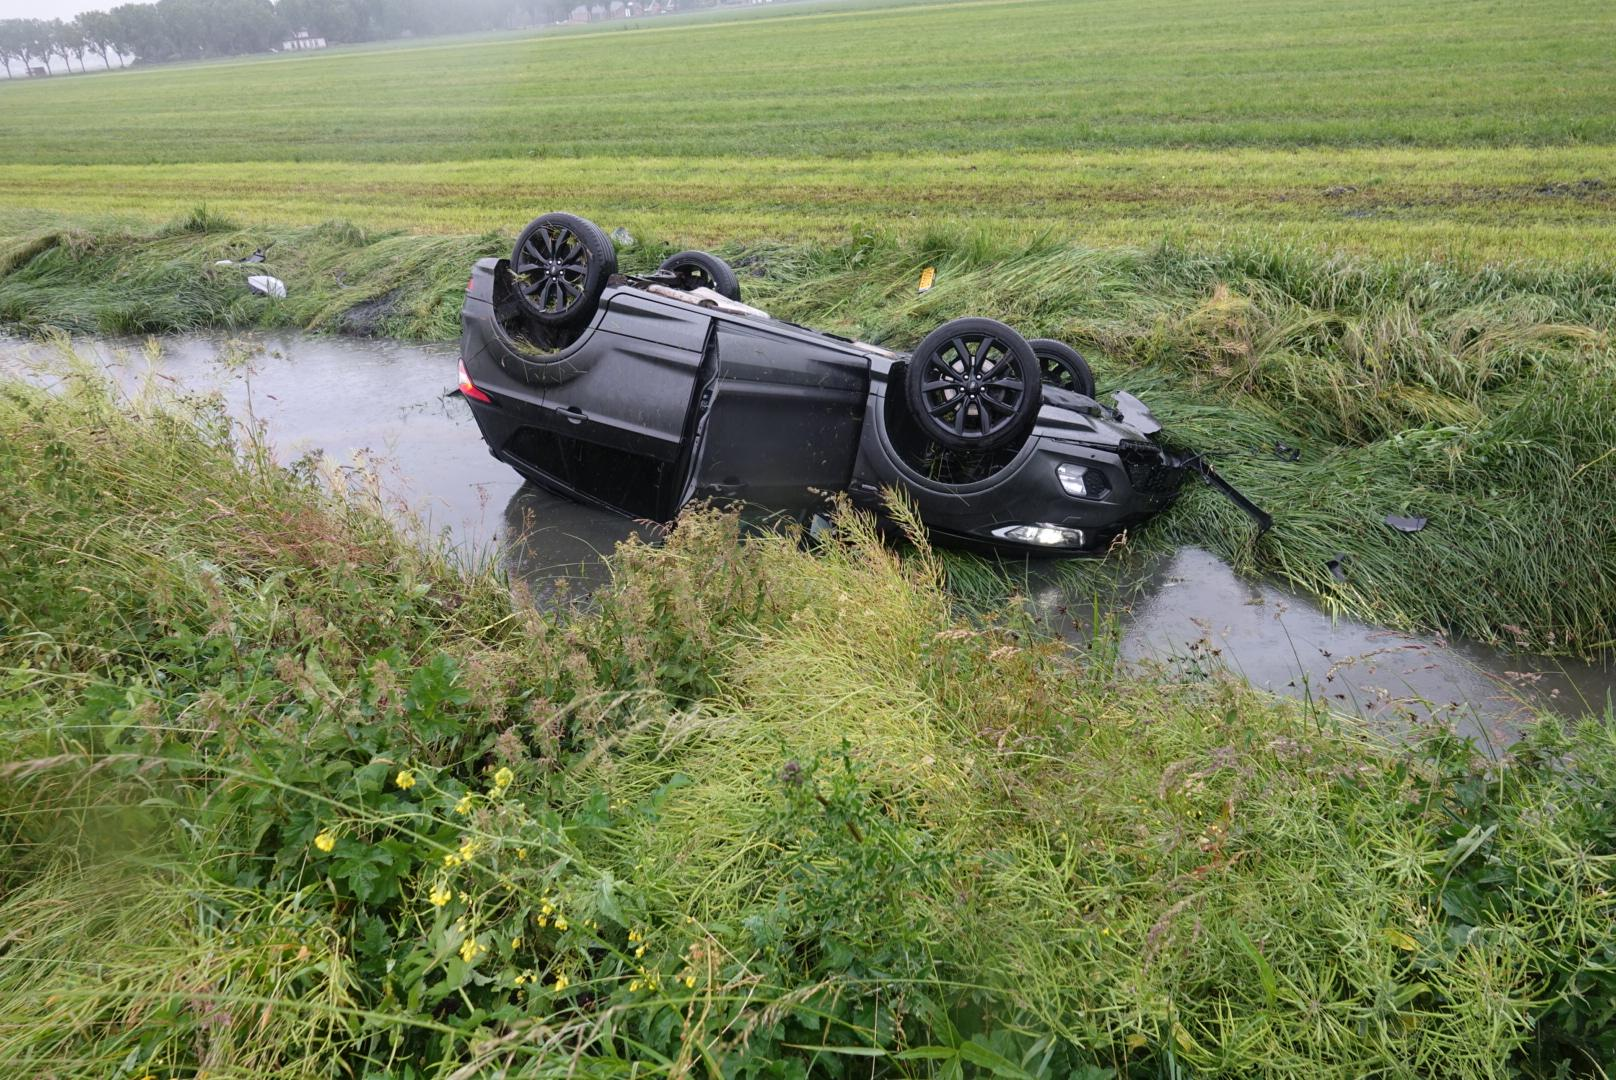 Auto te water in Middenbeemster; bestuurder gewond